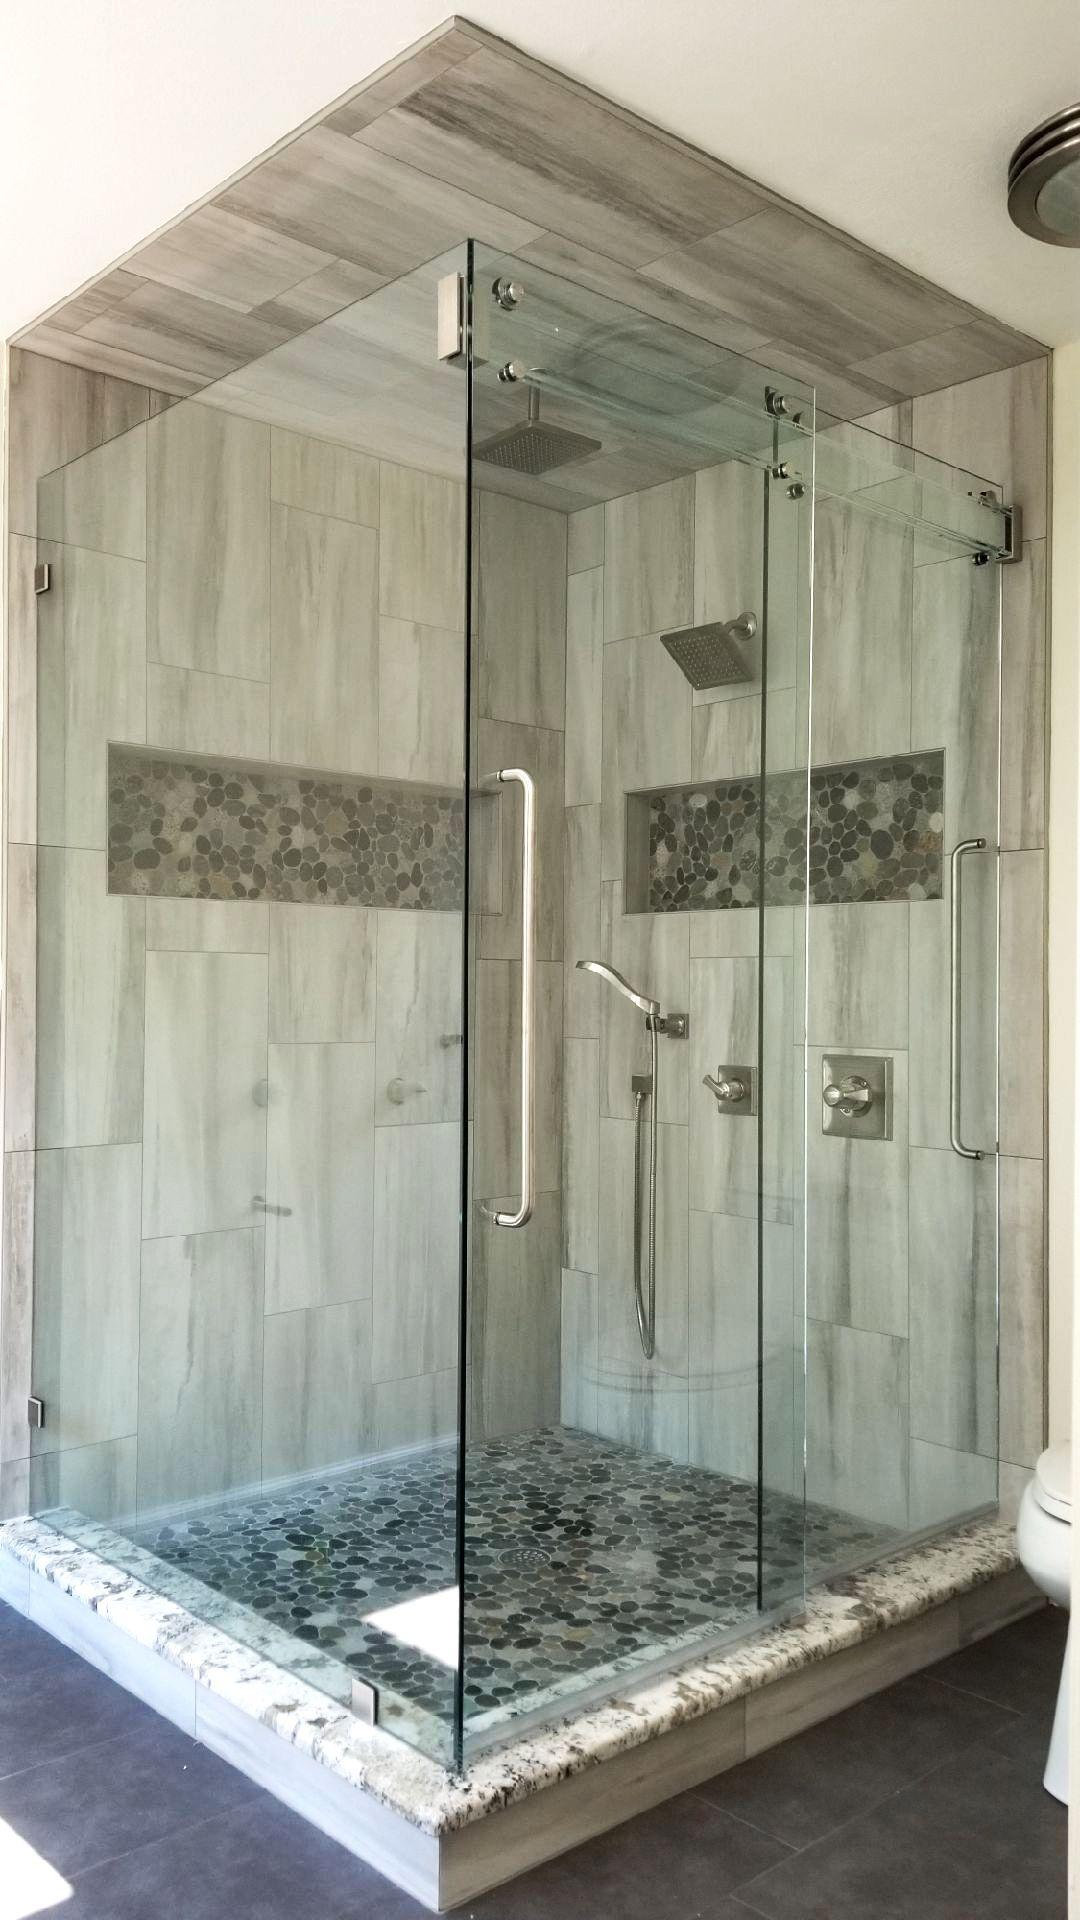 Barn Door Style Shower Enclosure All Glass Header Design Eliminating A Metal Bar Titan Phantom Bathroom Shower Room Divider Home